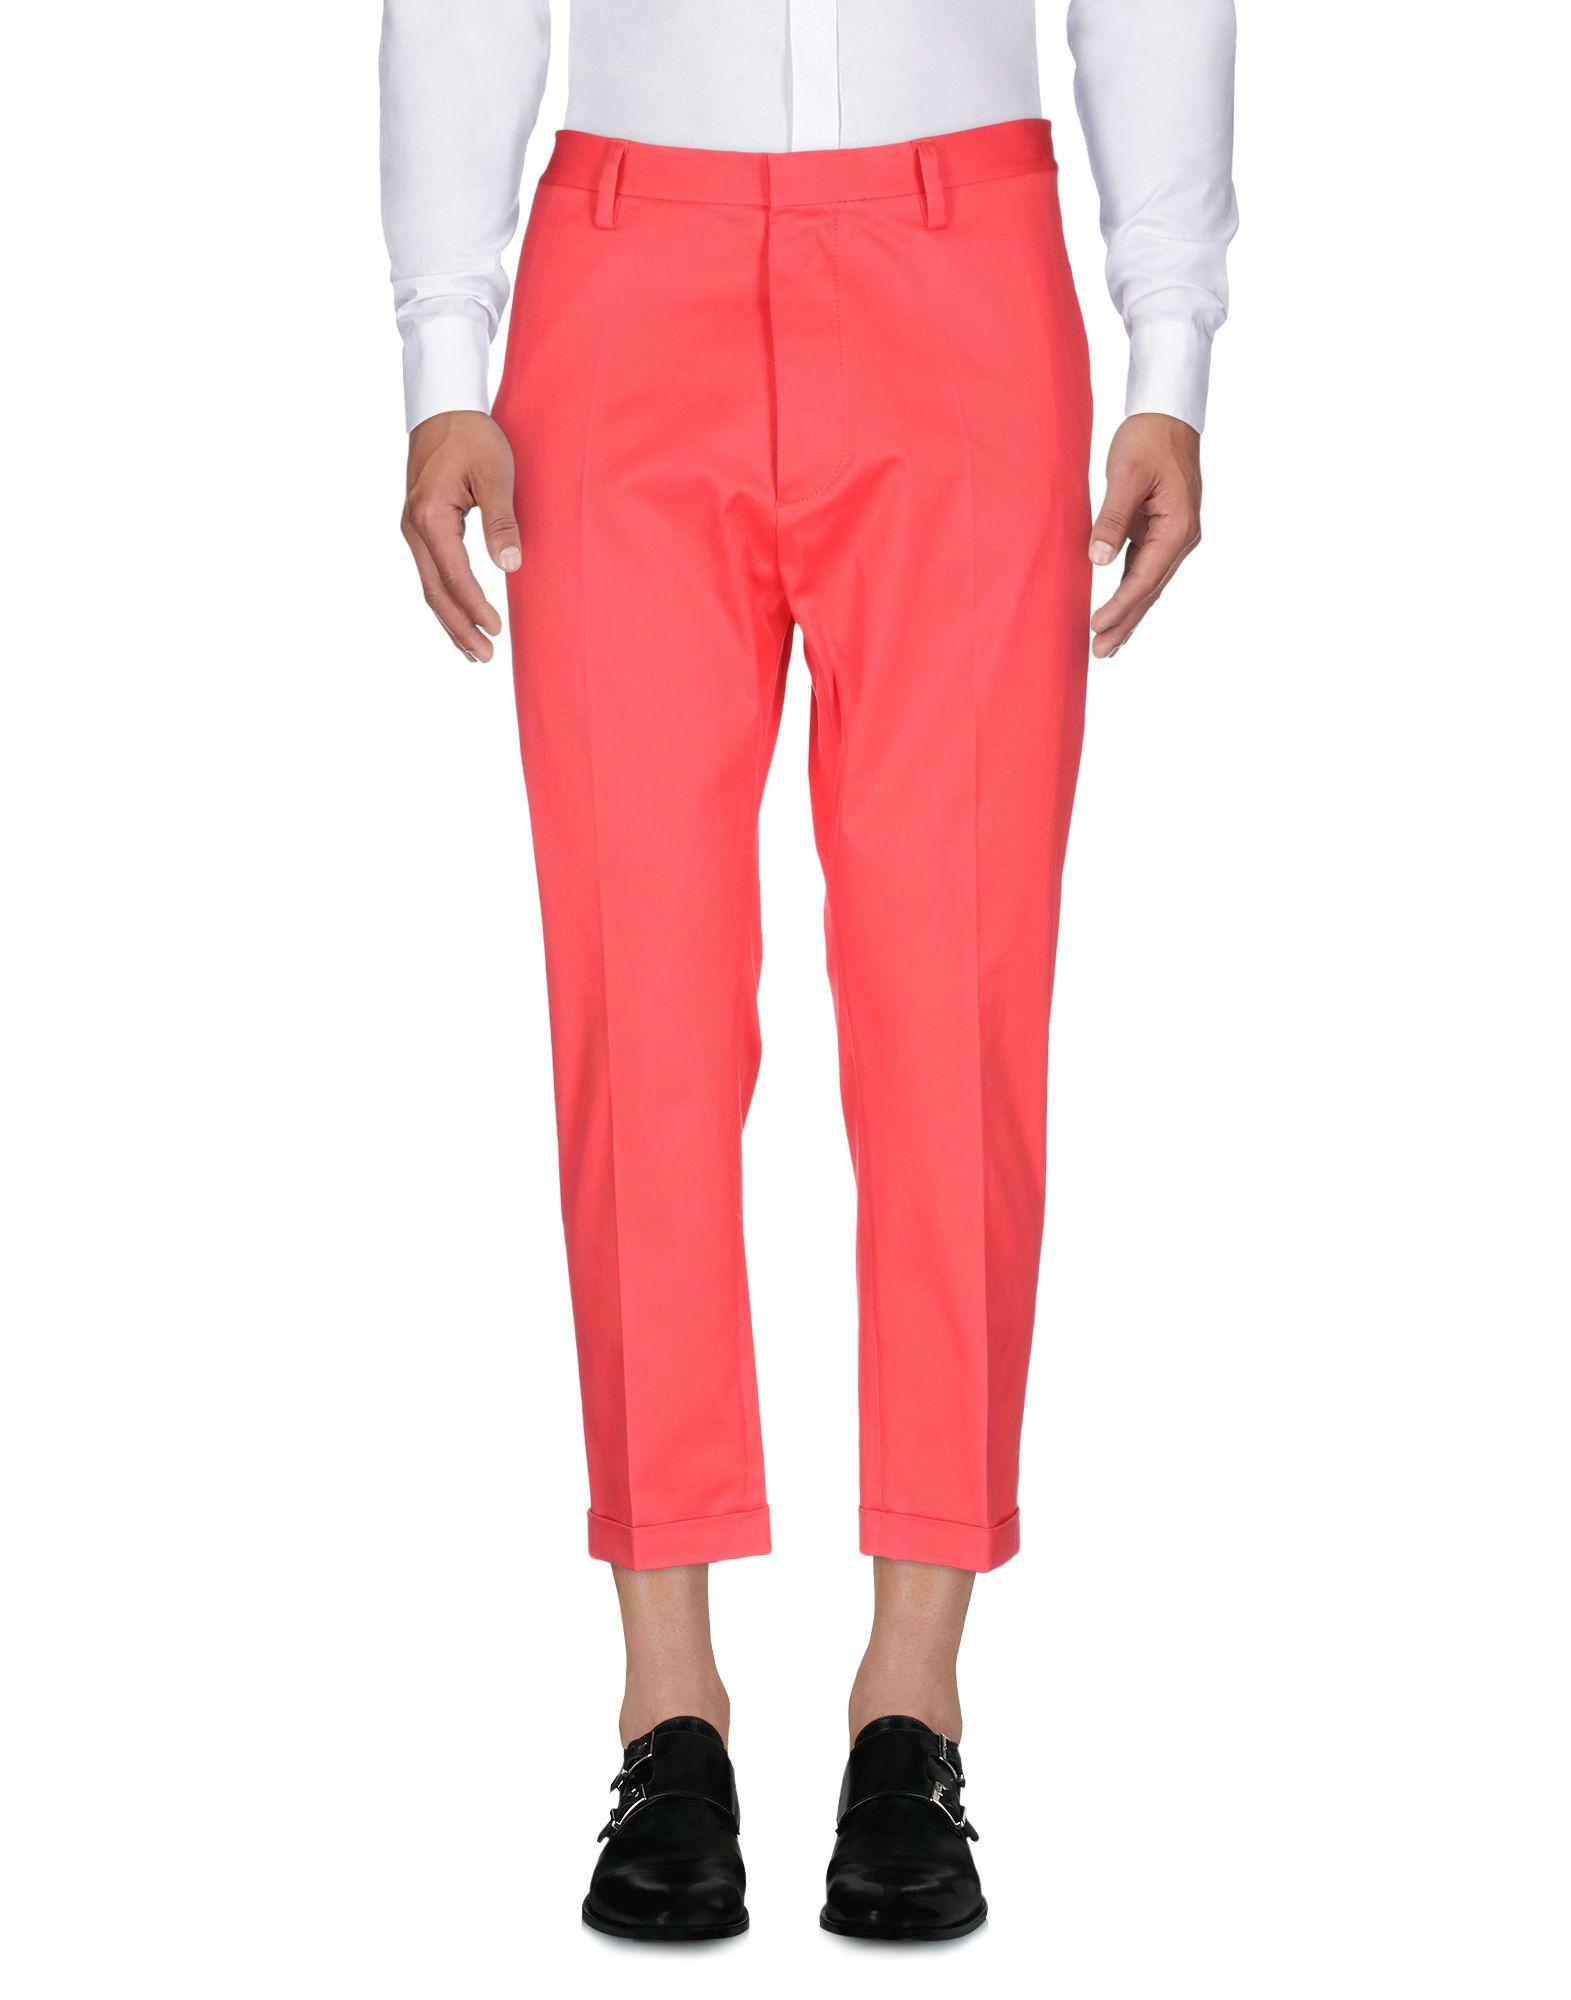 Pantalone Pantalone Pantalone Classico Dsquarosso2 Uomo - 36751981TG 9603d4